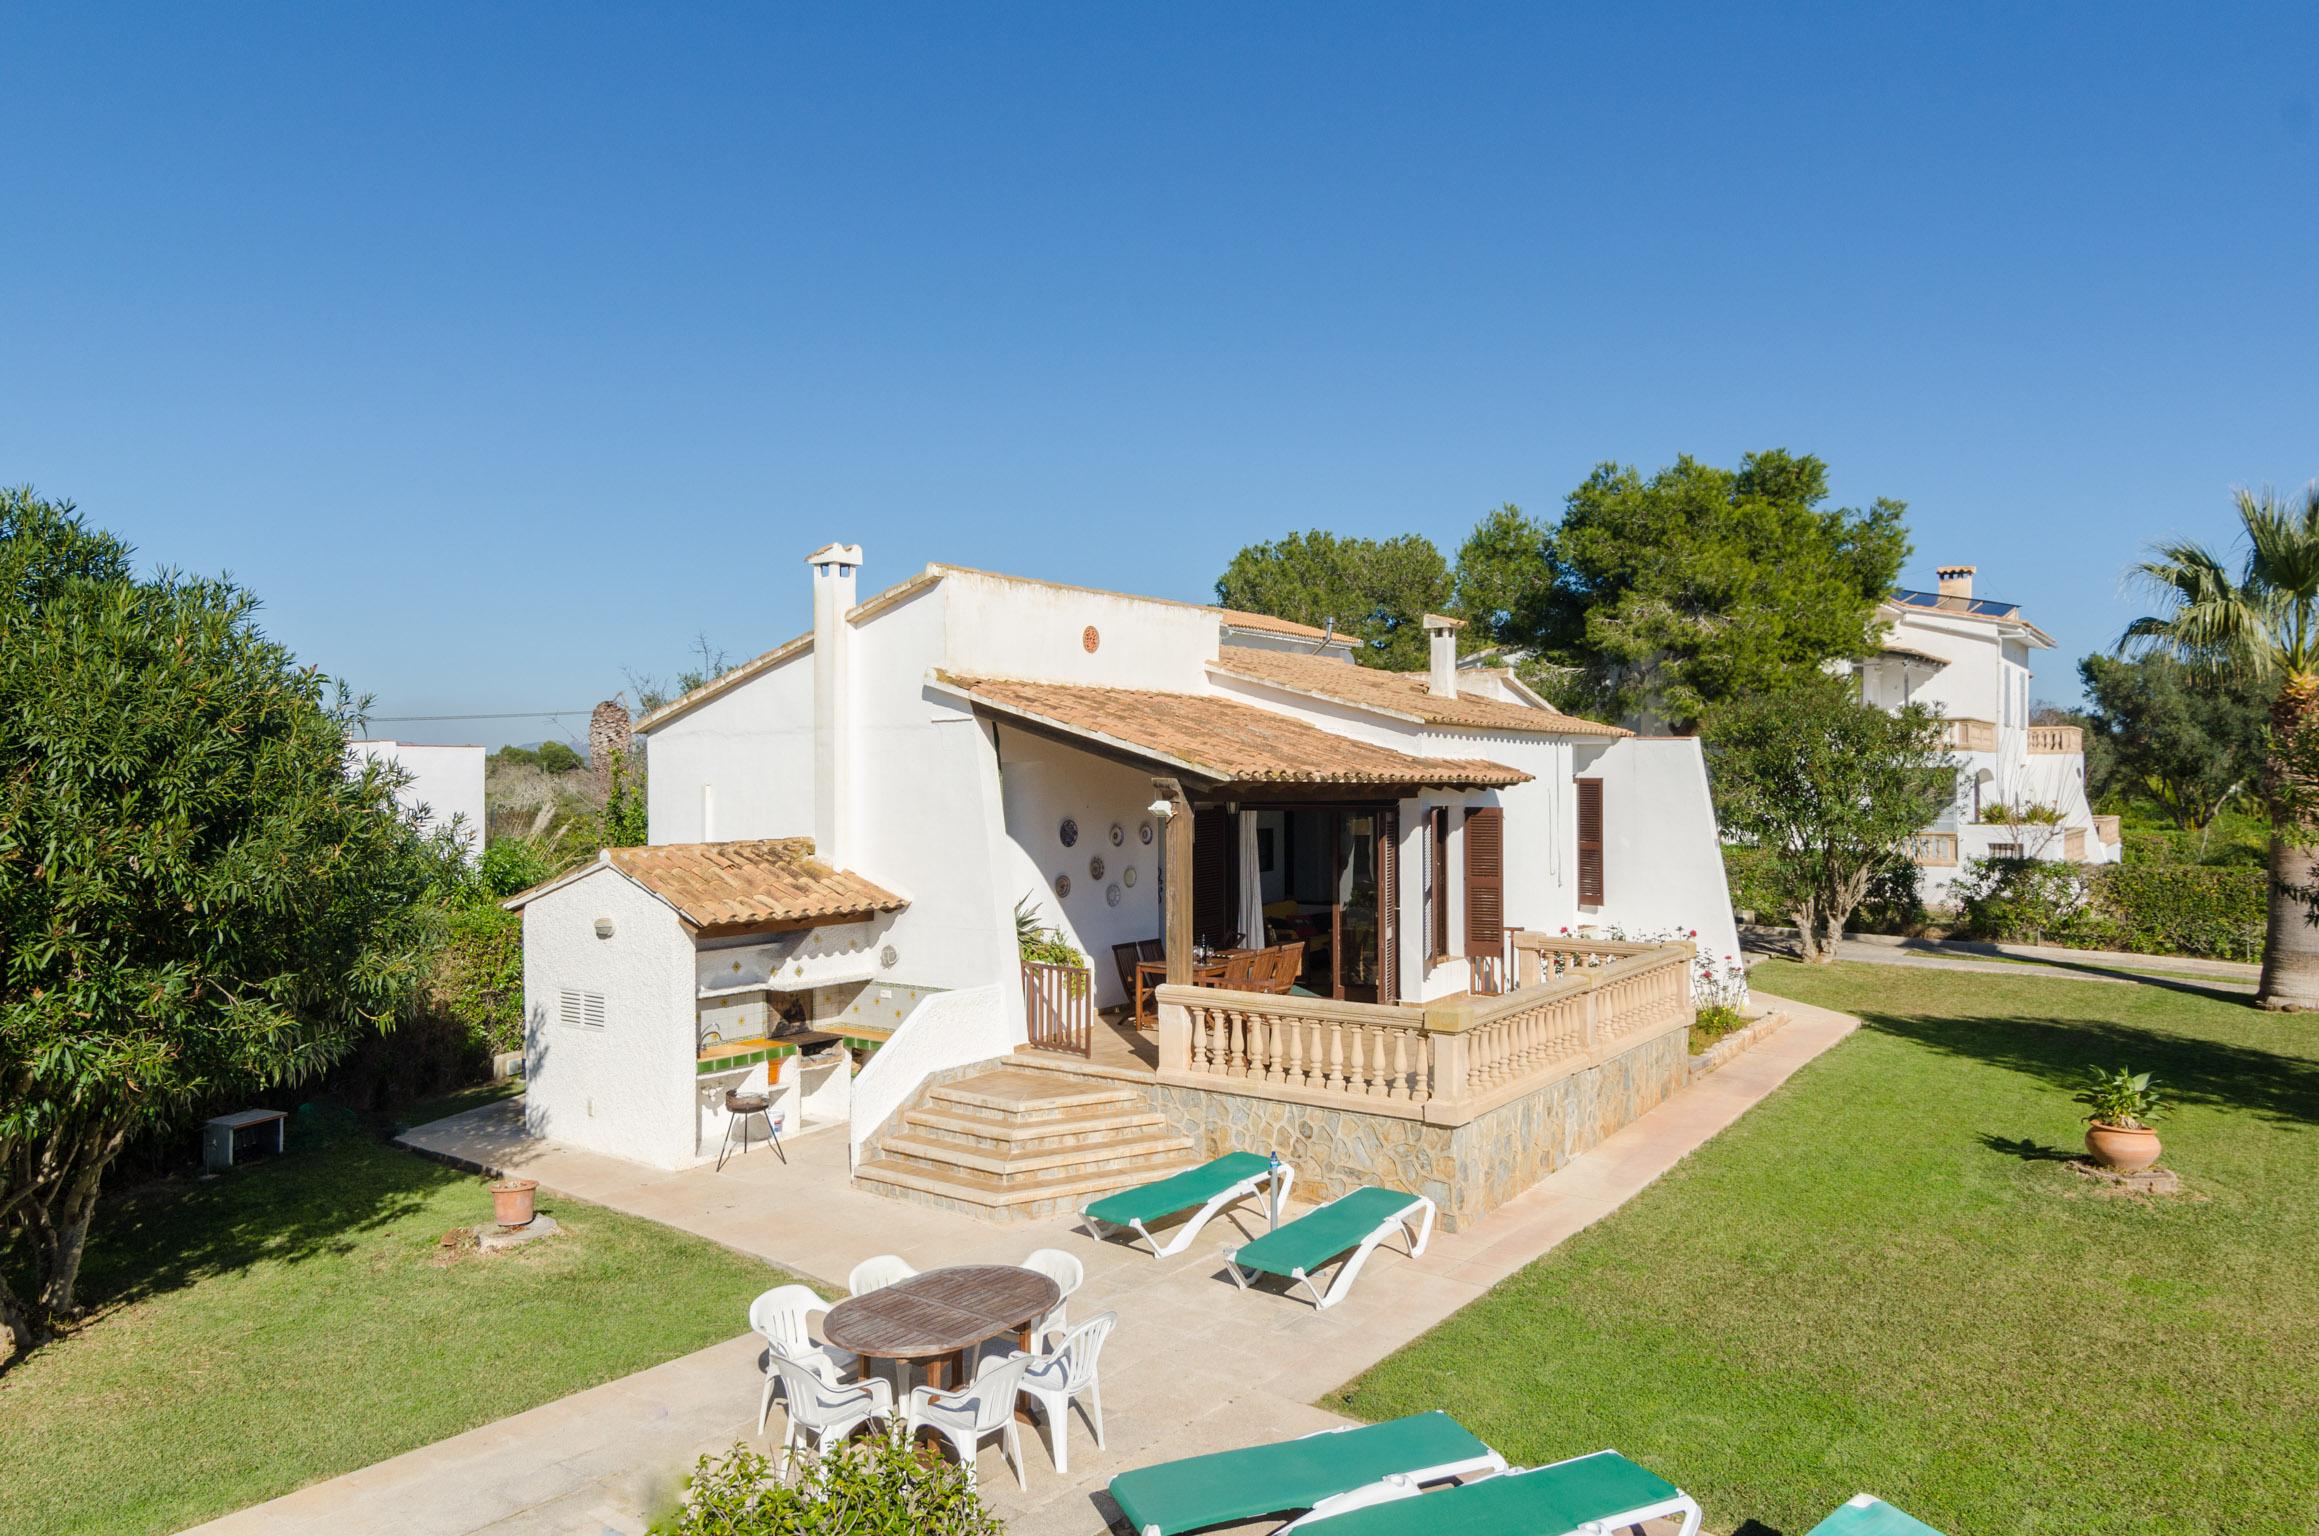 Ferienhaus CAN CALSINA (1871676), Cala Mandia, Mallorca, Balearische Inseln, Spanien, Bild 3